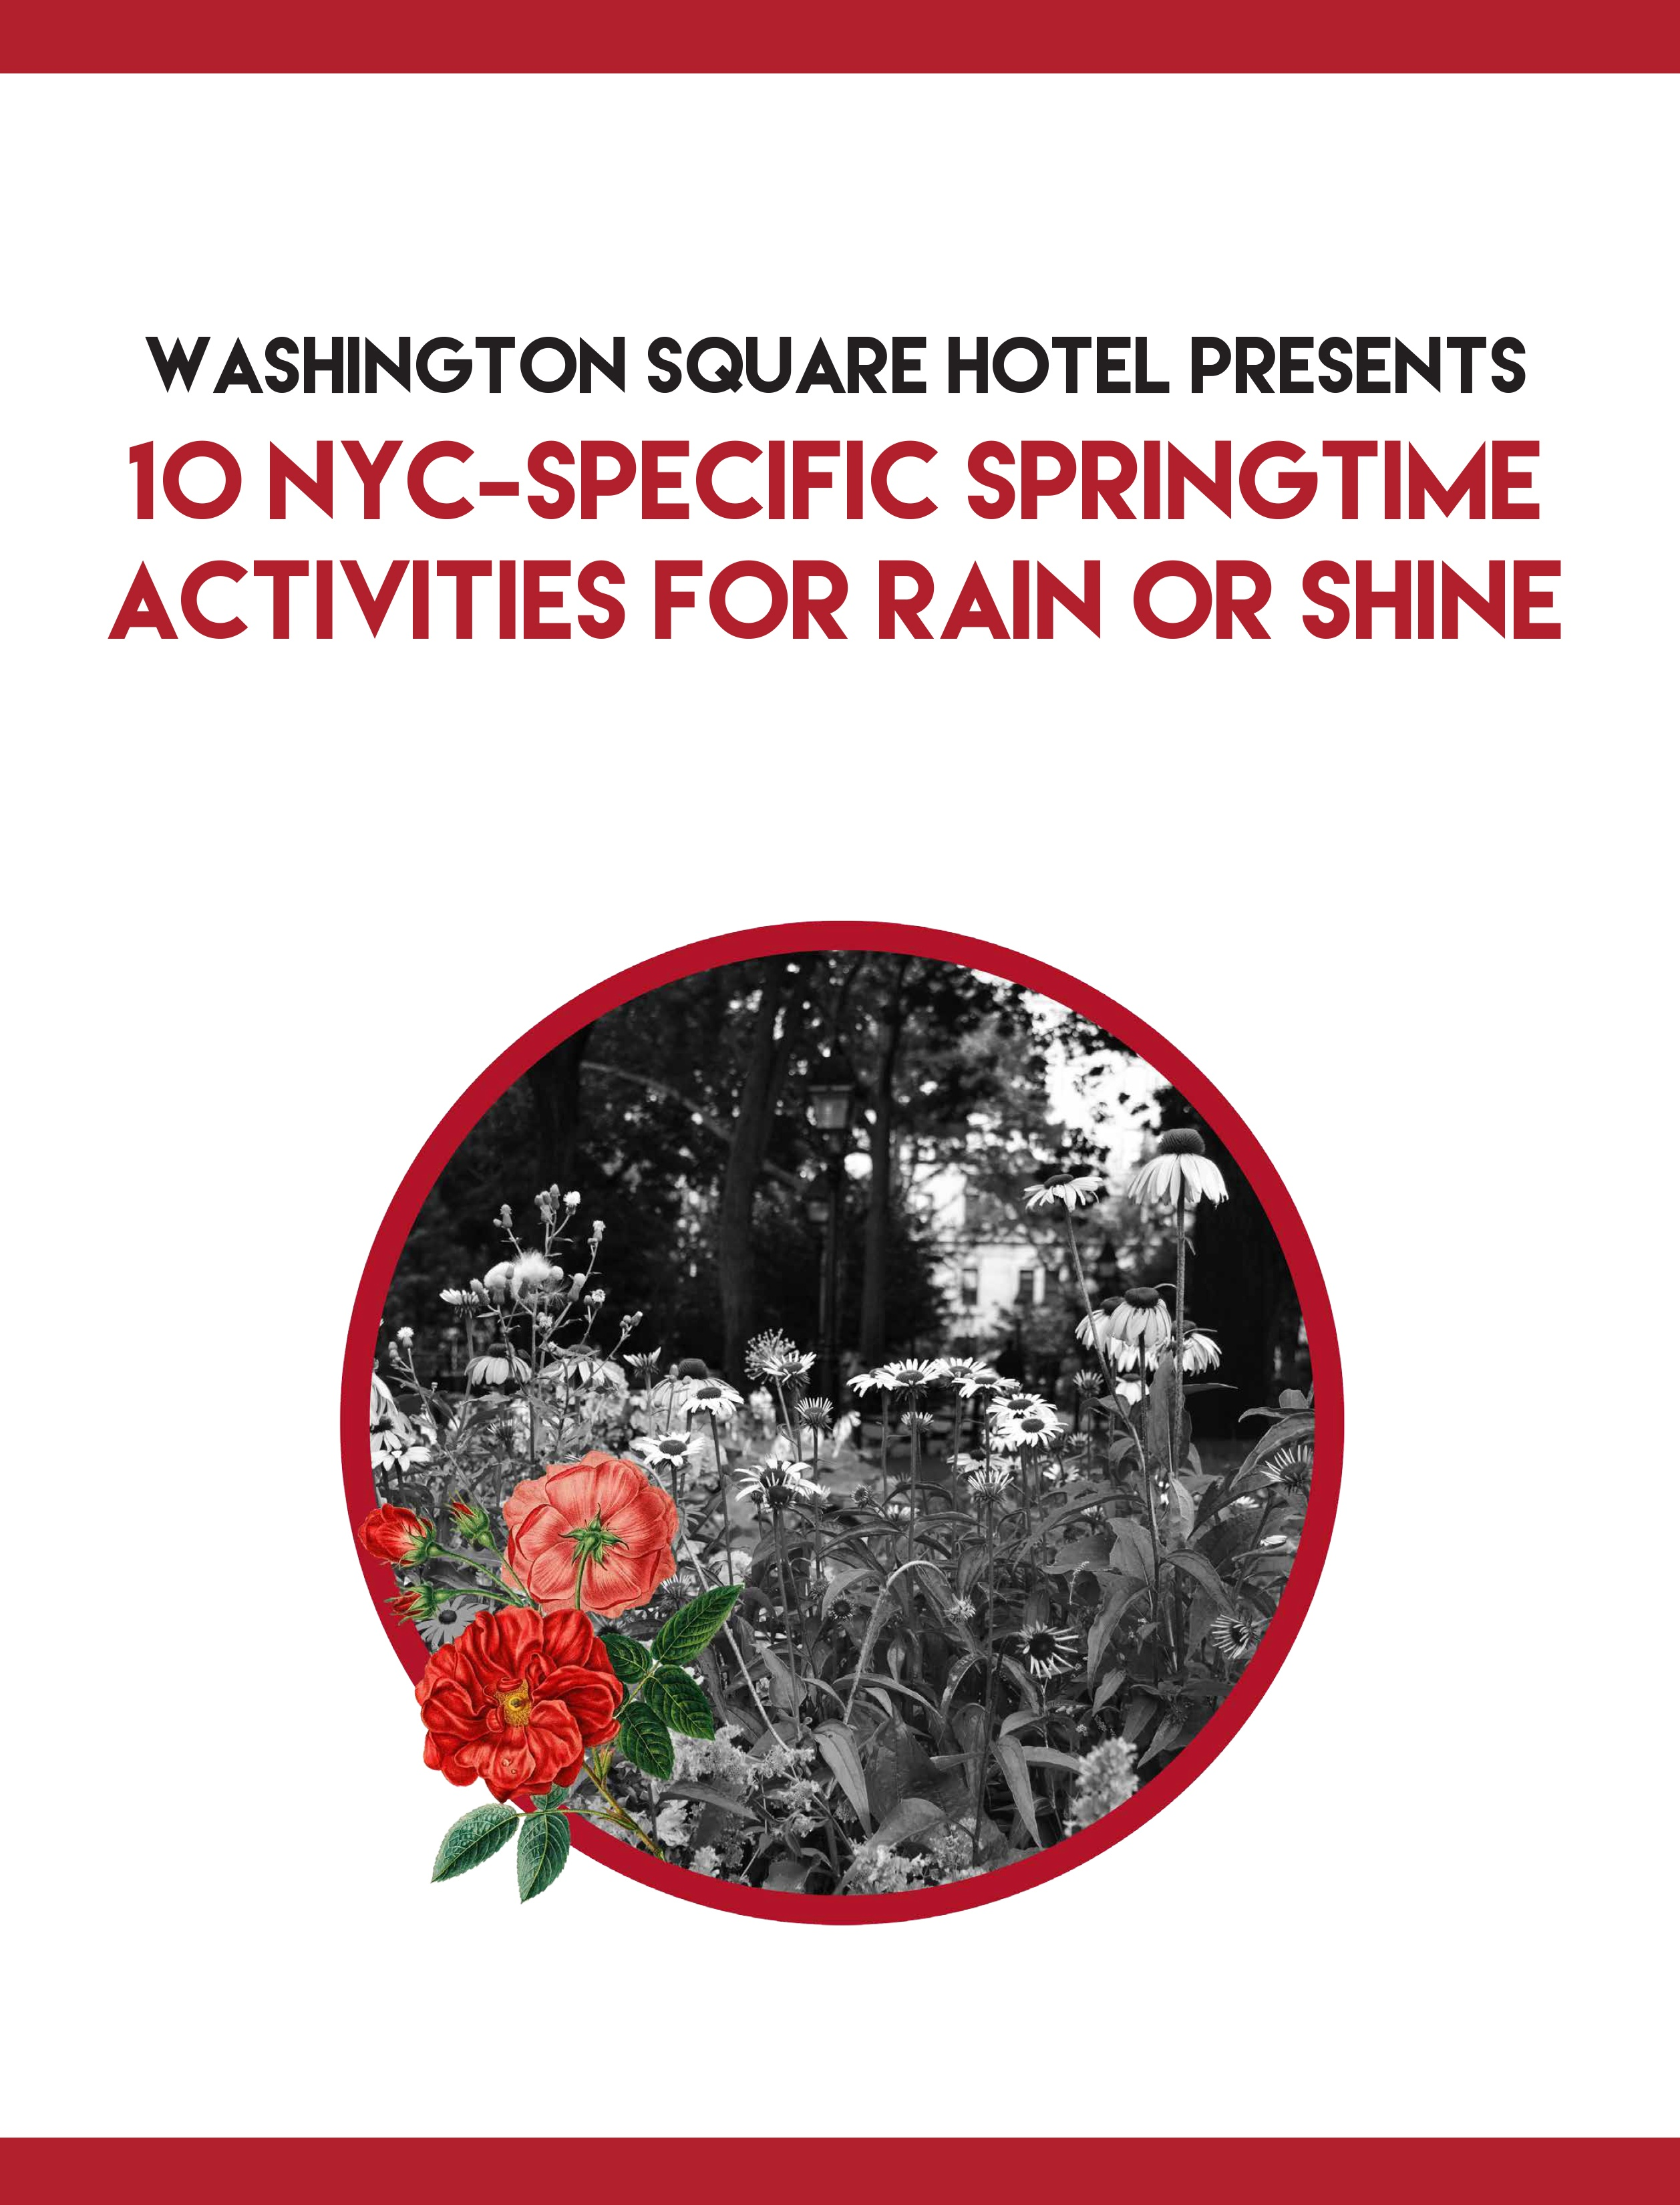 Springtime-Activities-Cover.jpg